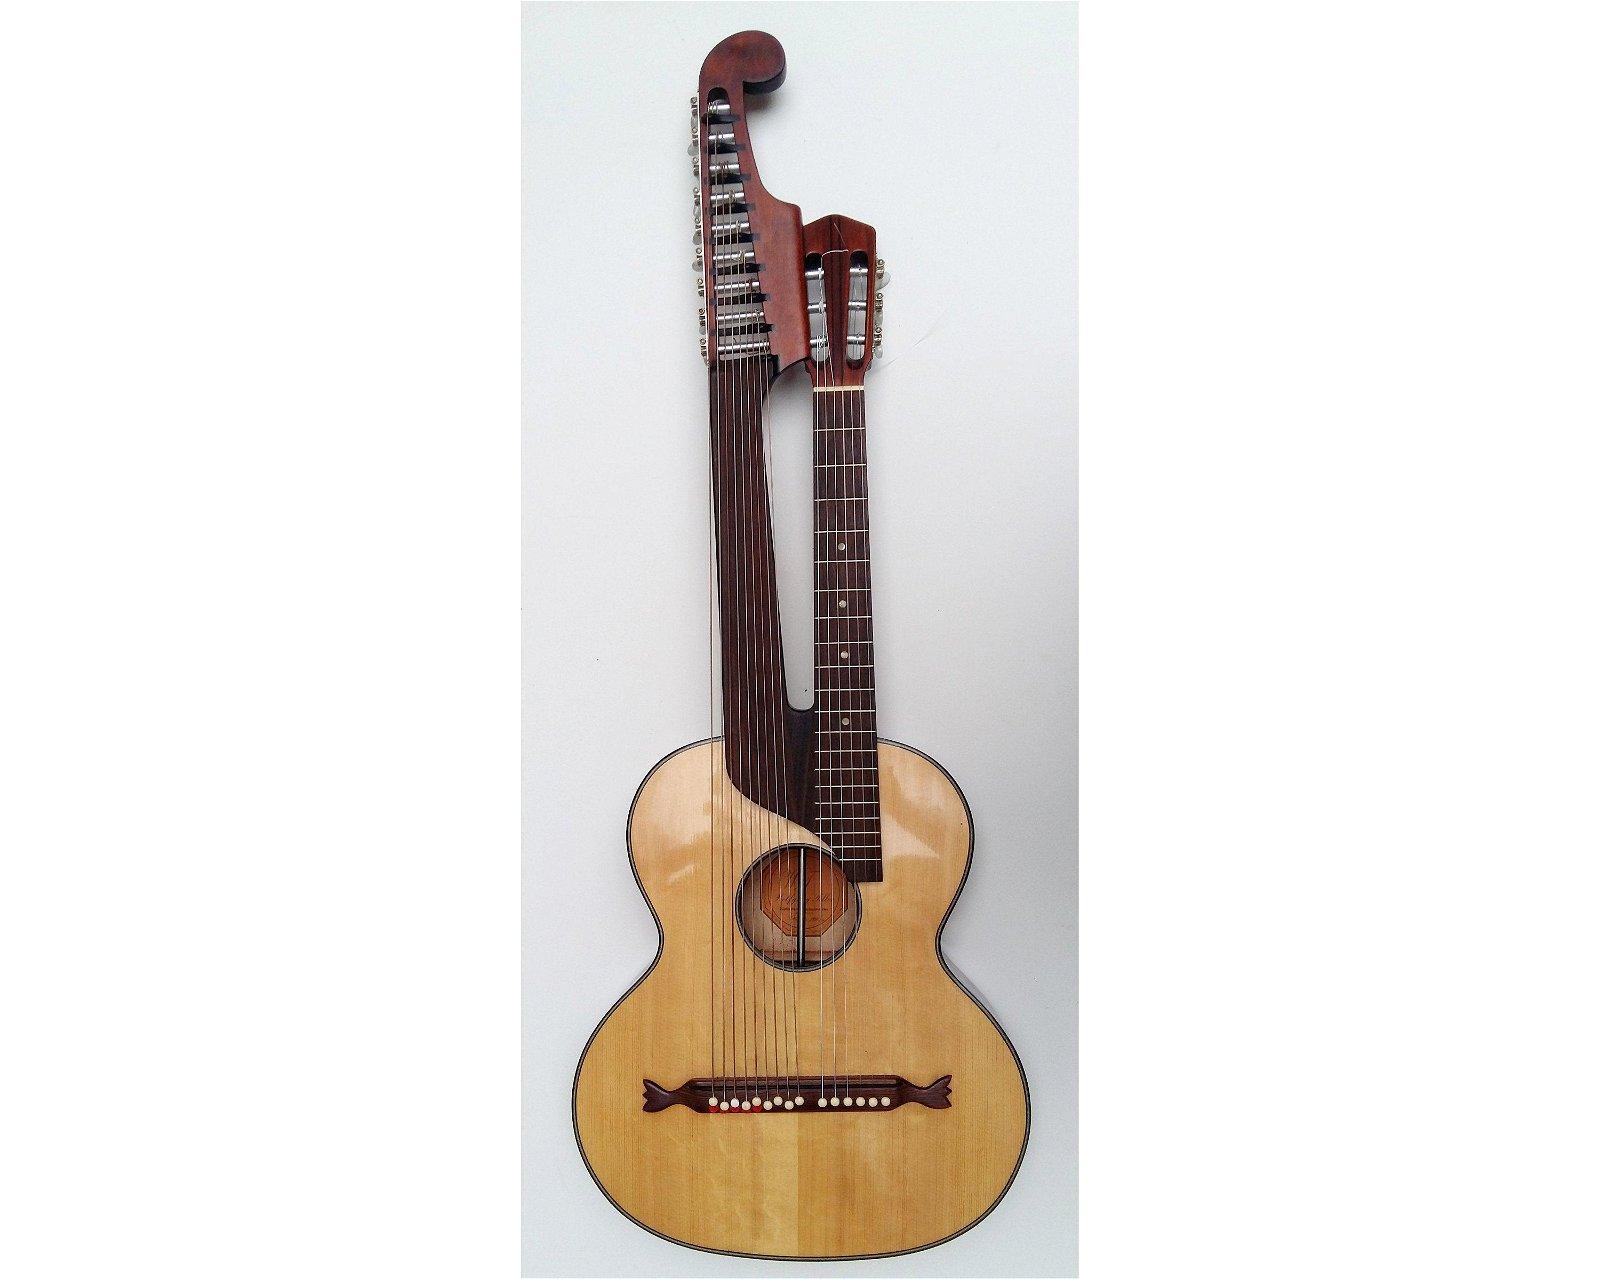 WOLFGANG TELLER Harp-guitar B15 - 15 strings, Germany